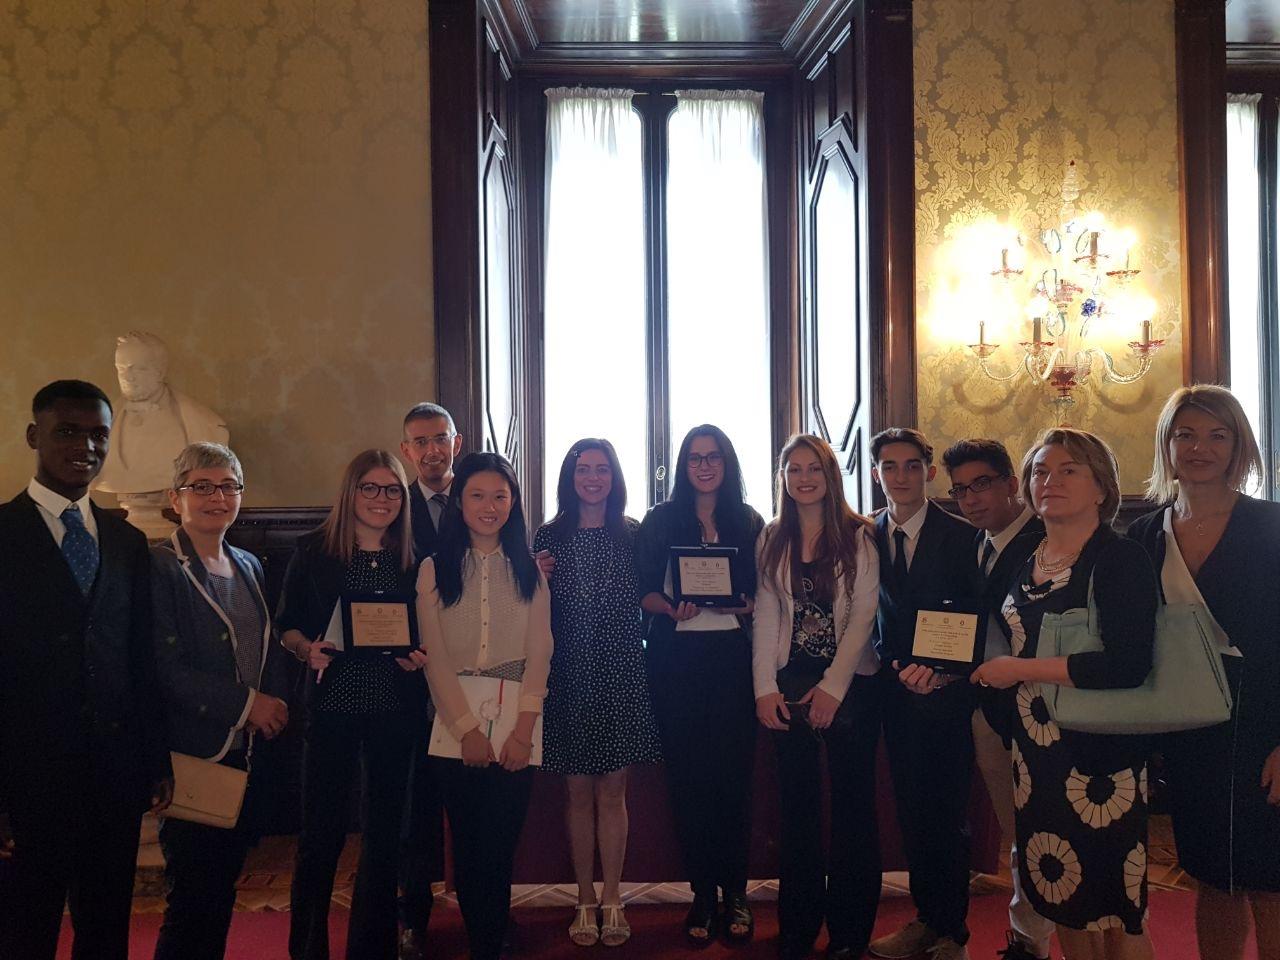 I tre vincitori della regione Emilia-Romagna: Liceo C. Sigonio (MO), ITCS Salvemini (BO), Istituto professionale Galvani-Iodi (RE)